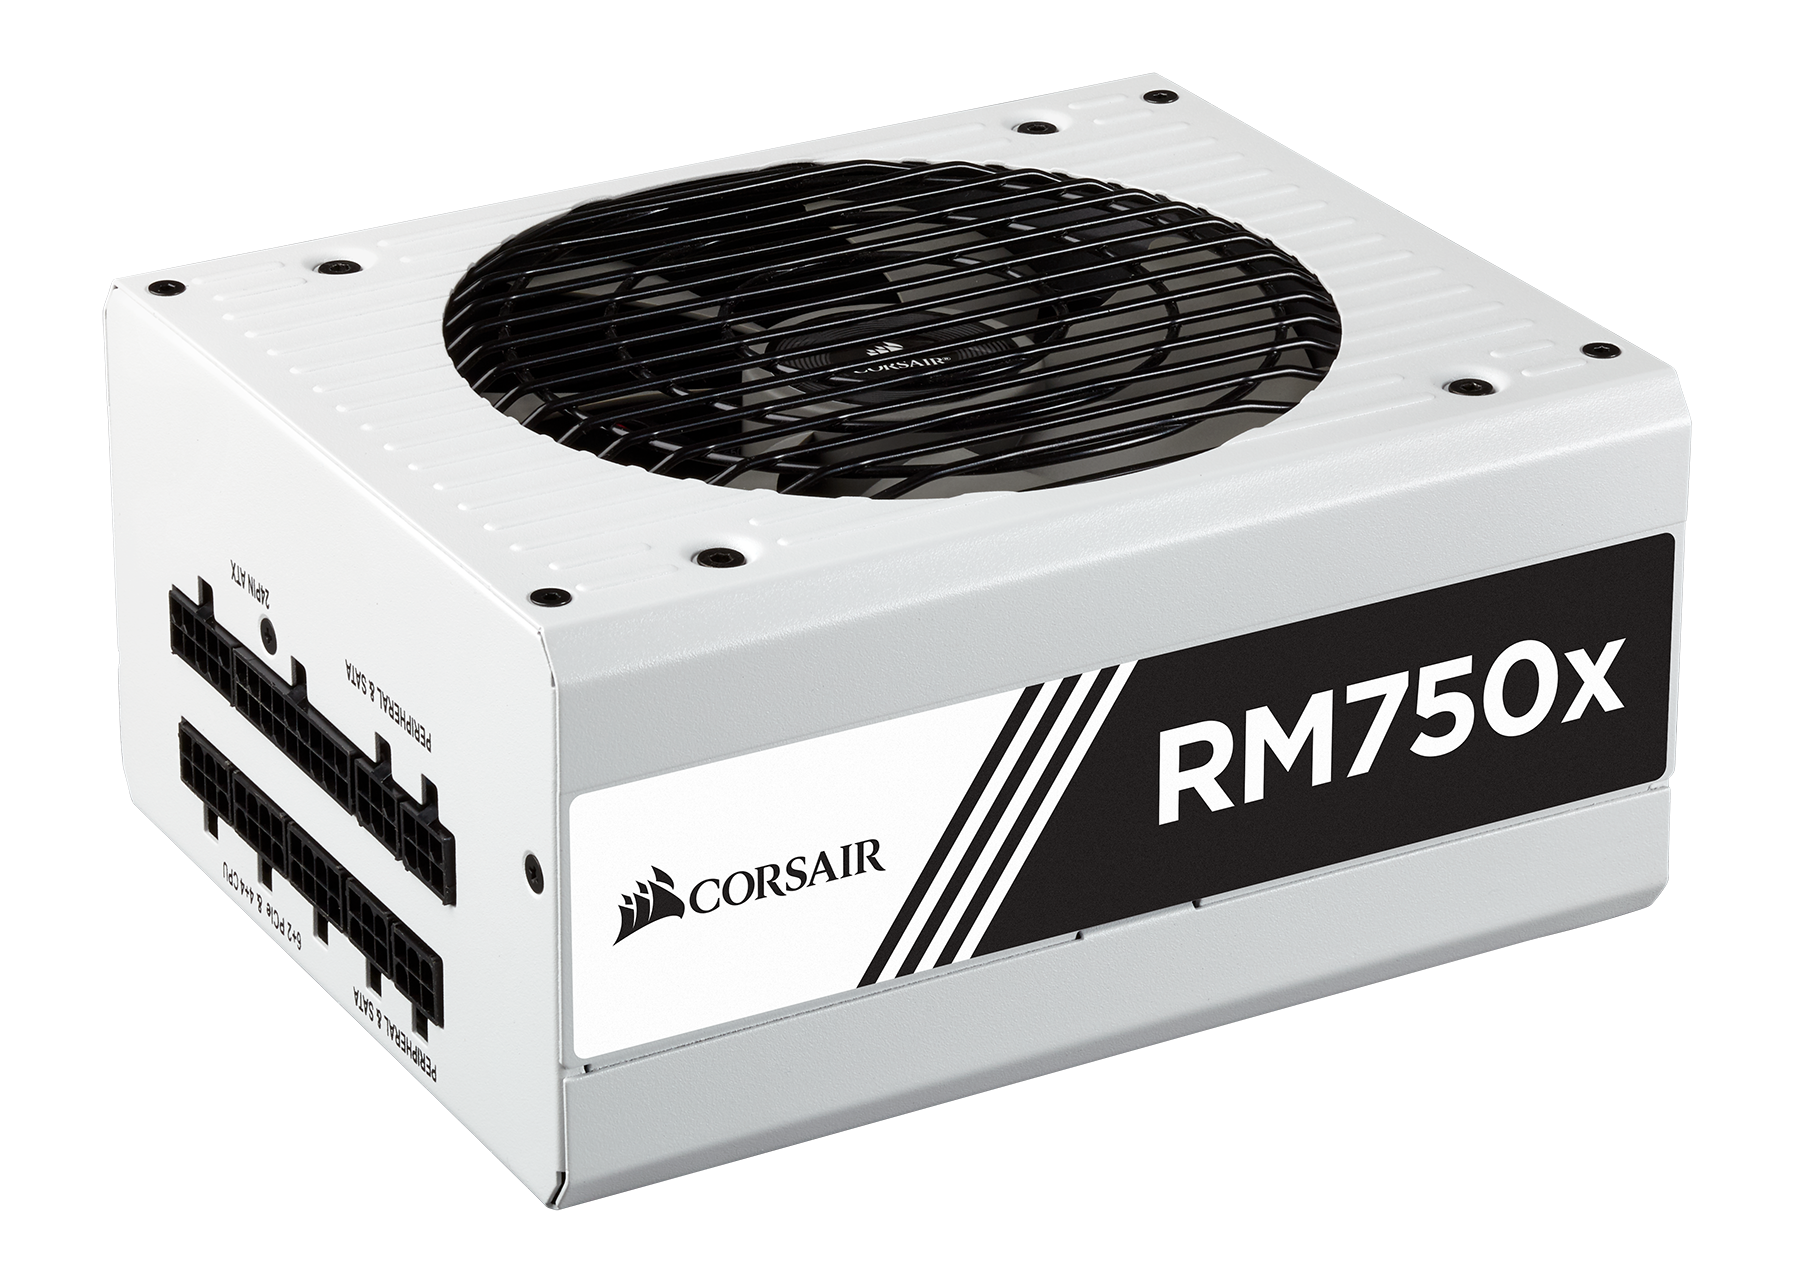 Corsair Rm750x White Cp 9020155 Na 750w Atx12v Eps12v 80 Plus Gold Antec Power Supply Tester Media